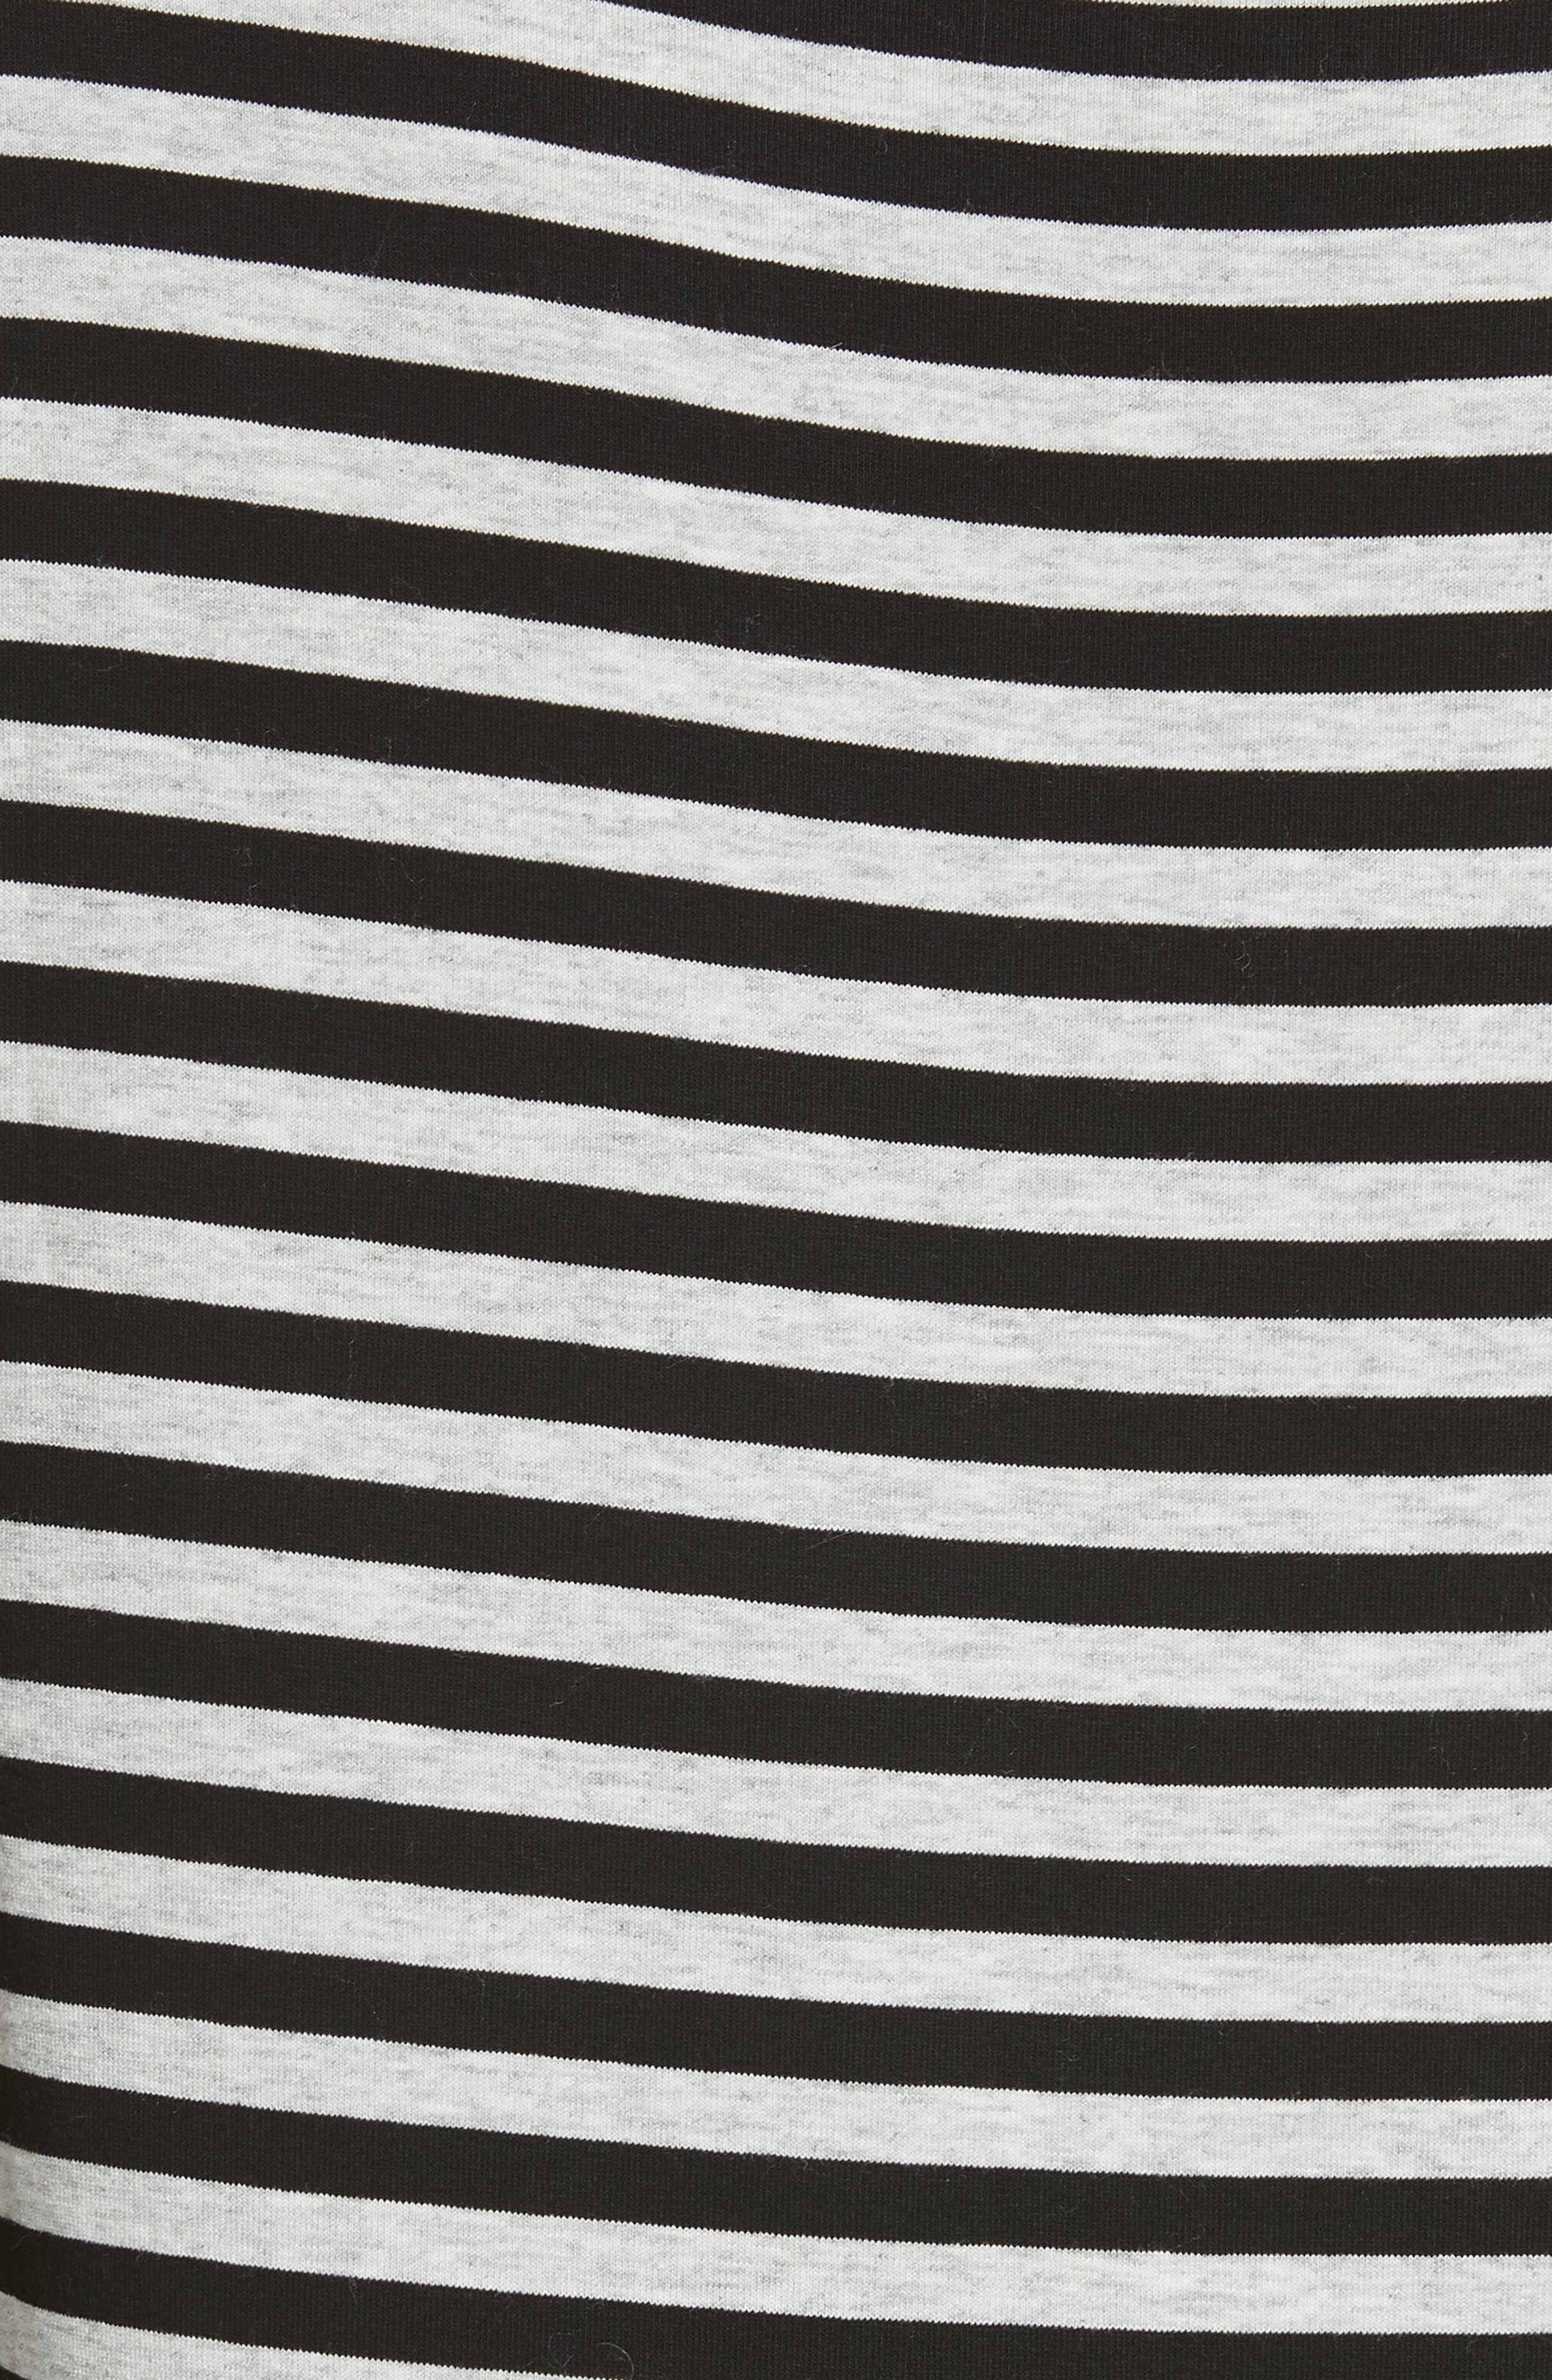 Stripe Bateau Neck Long Sleeve Tee,                             Alternate thumbnail 5, color,                             HEATHER GREY- BLACK STRIPE